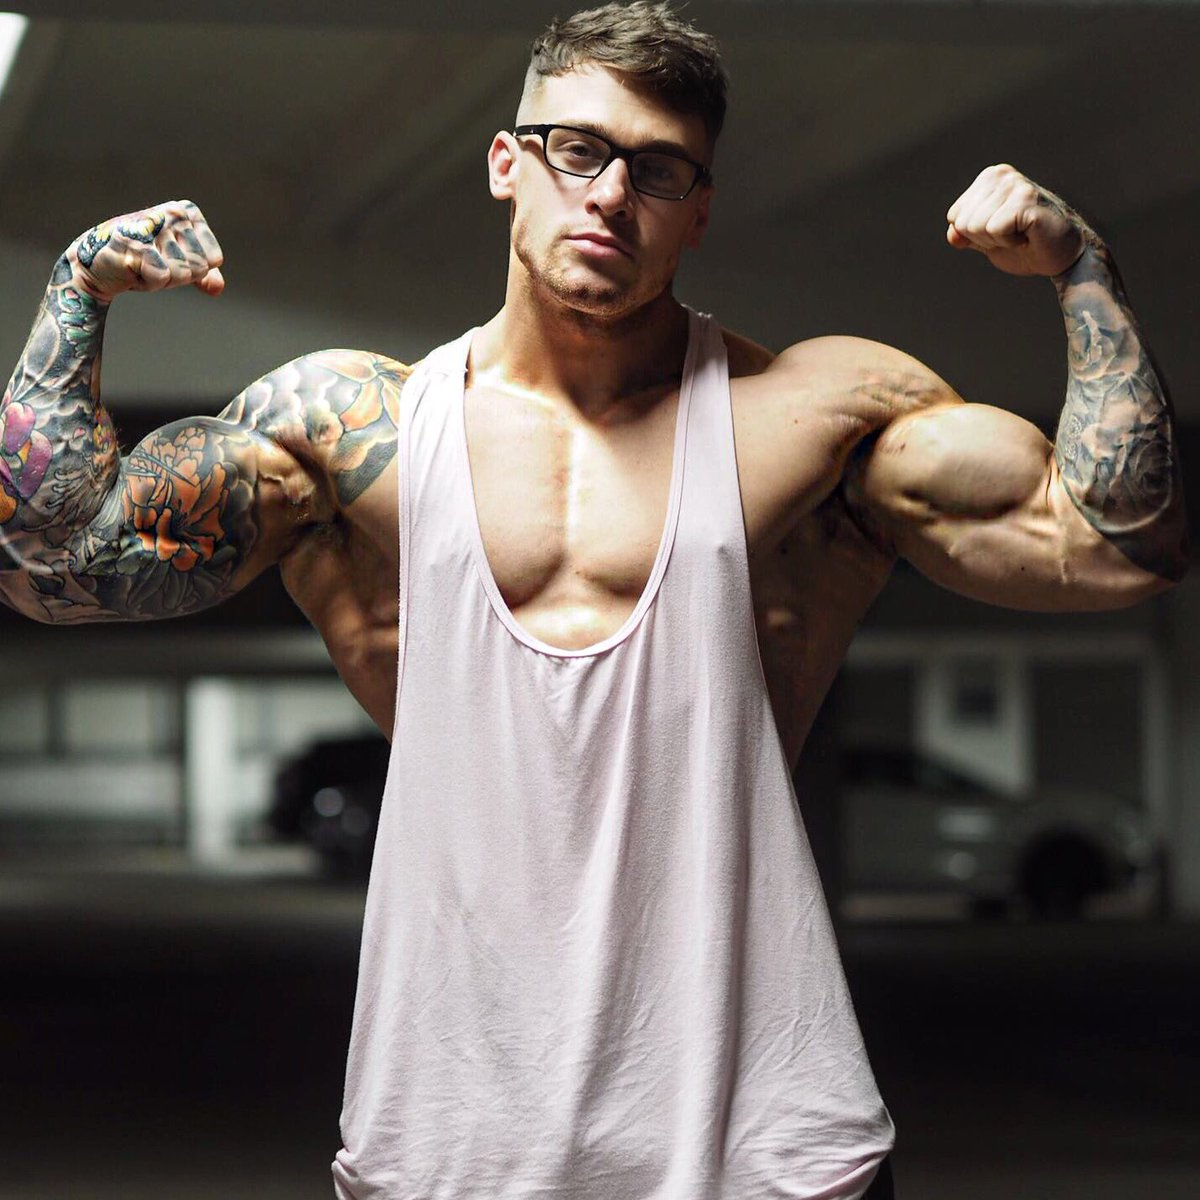 Татуировки на бицепсе в картинках